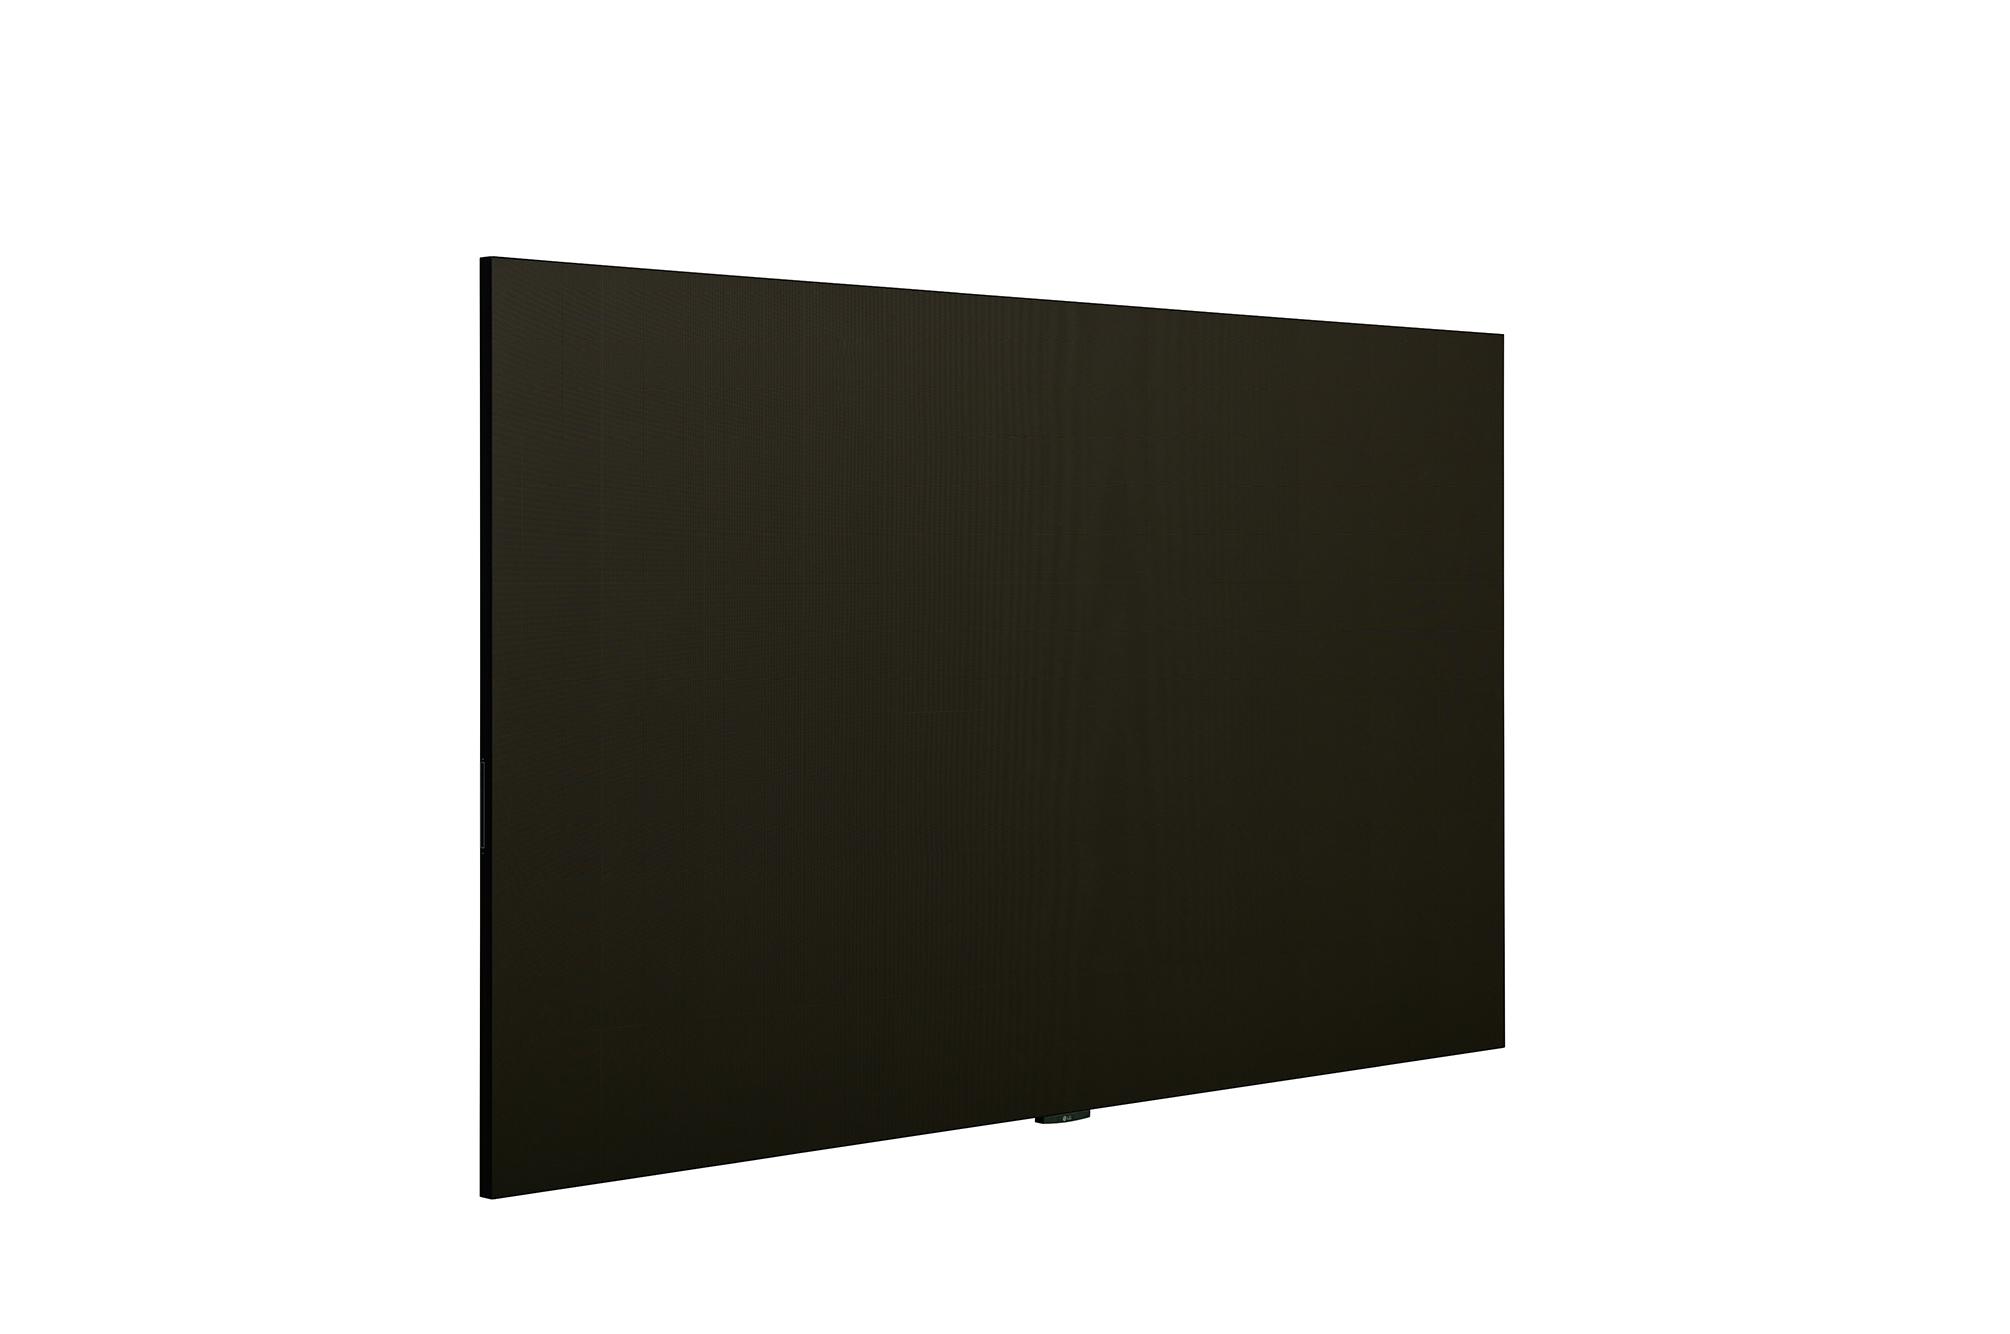 LED Signage LAEC015, +45 degree side view